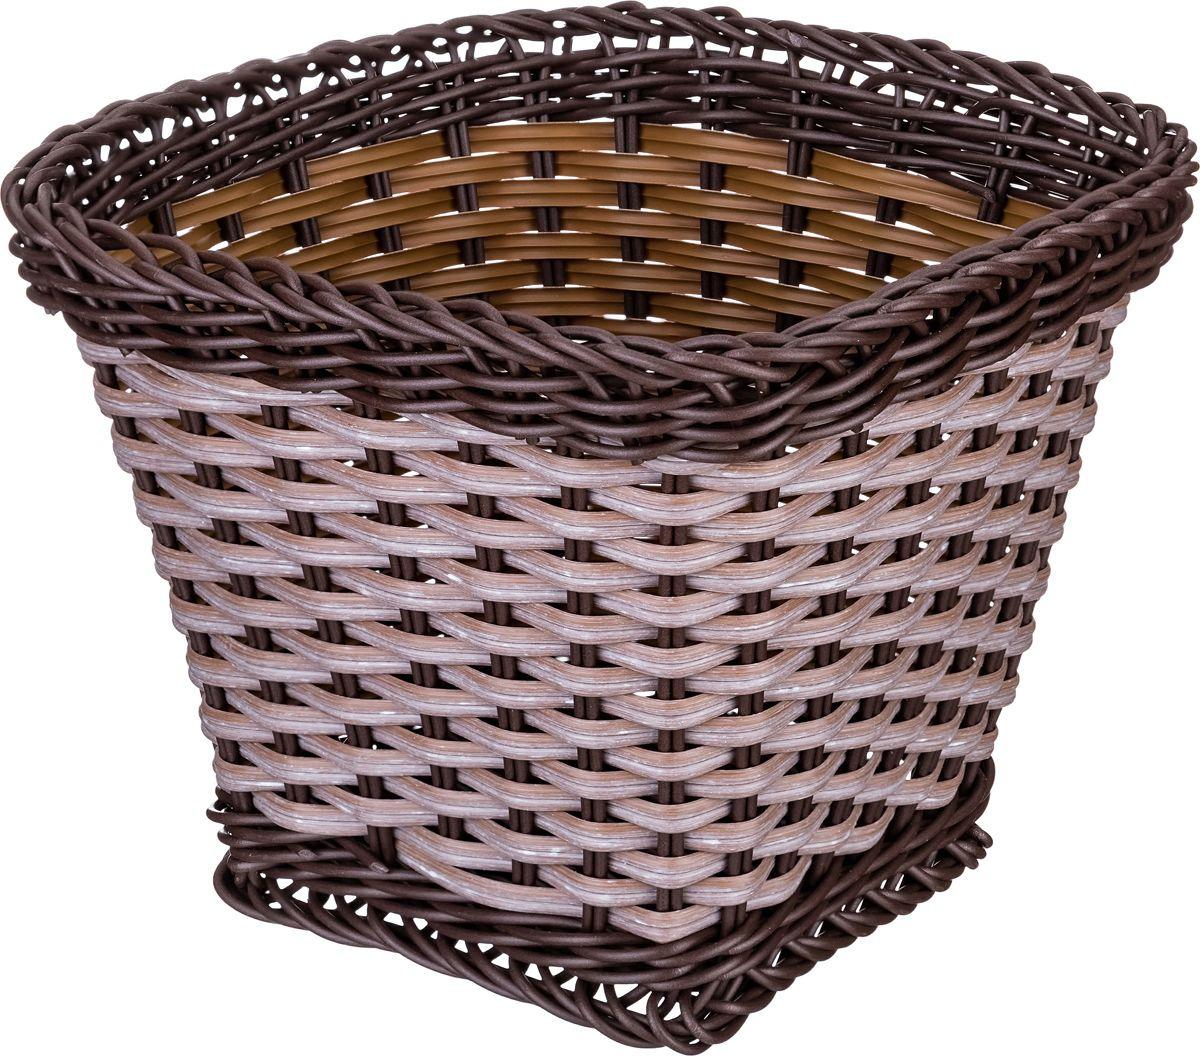 Корзина для мелочей Lefard, цвет: коричневый, 20 х 17 х 14 см контейнер для мелочей violet цвет белый 16 х 17 х 18 см